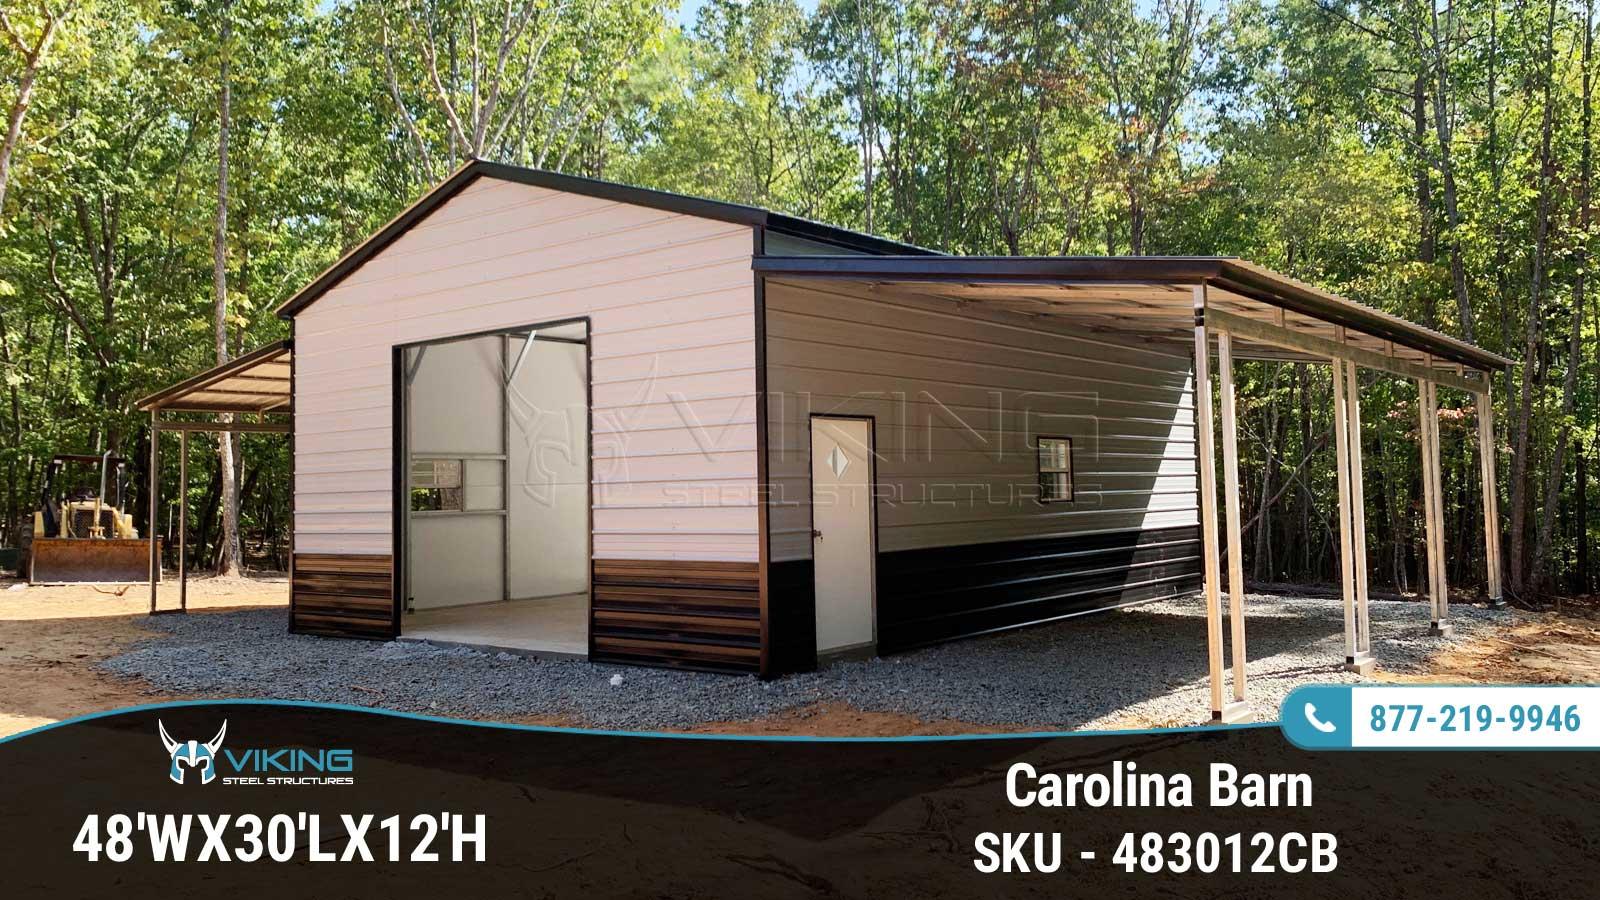 48'Wx30'Lx12'H Carolina Barn